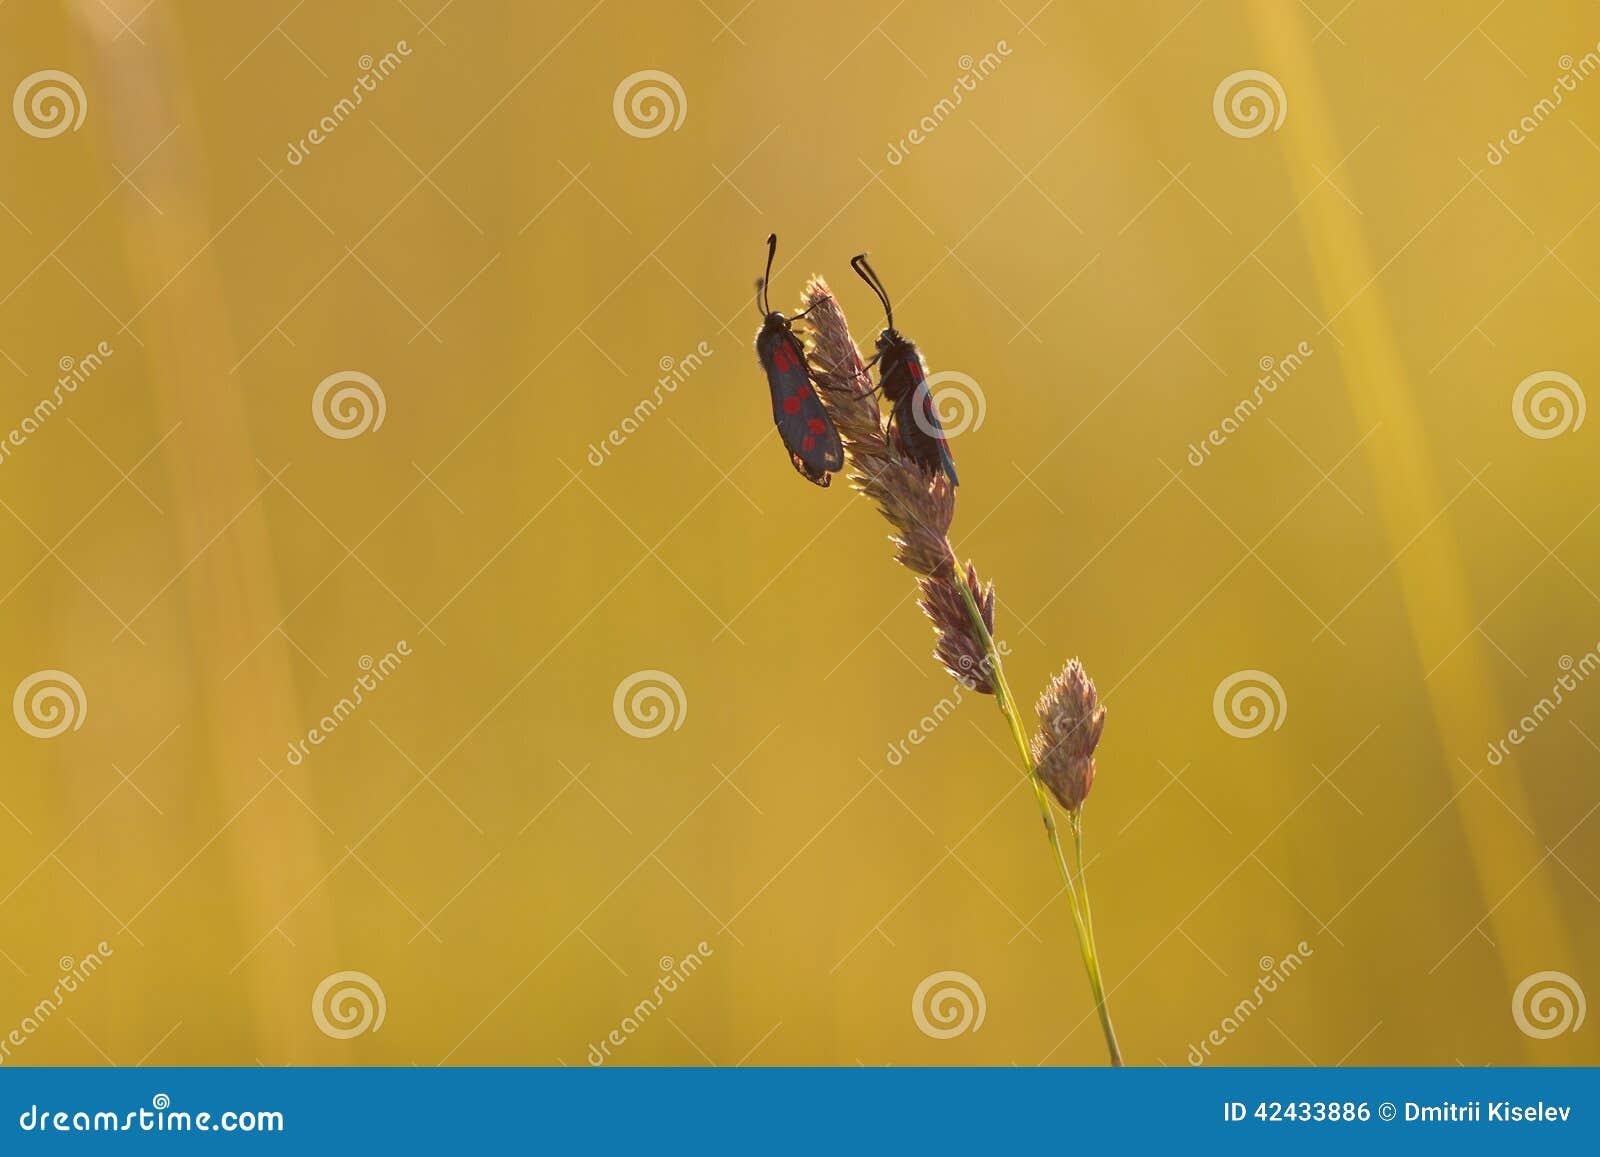 Dos mariposas se sientan enfrente de uno a